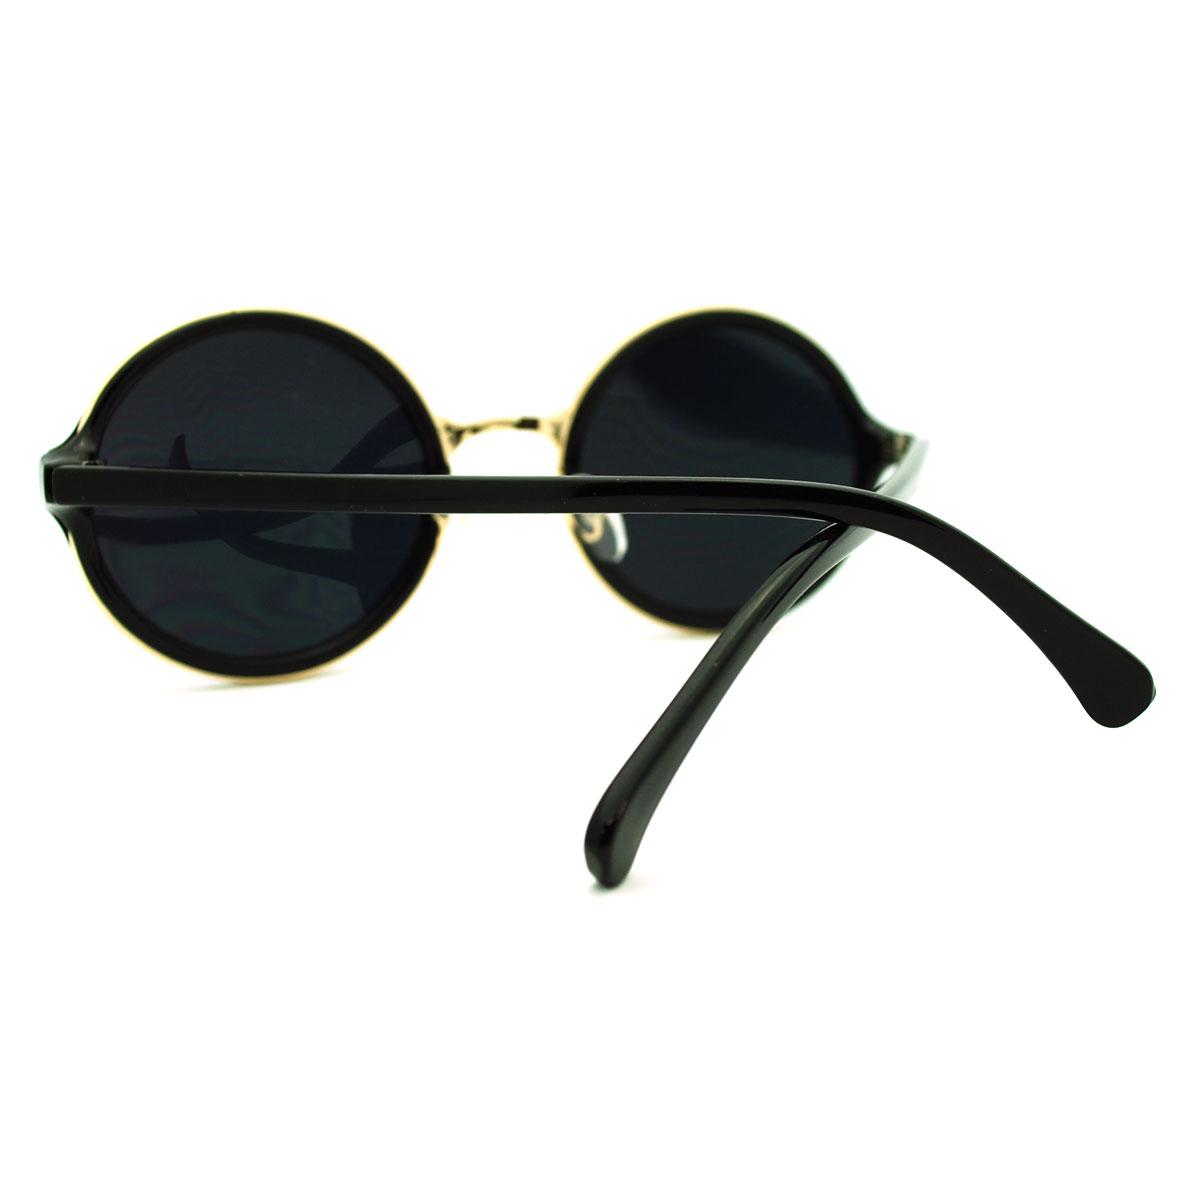 baa4835d51cd Circular Sunglasses Ebay